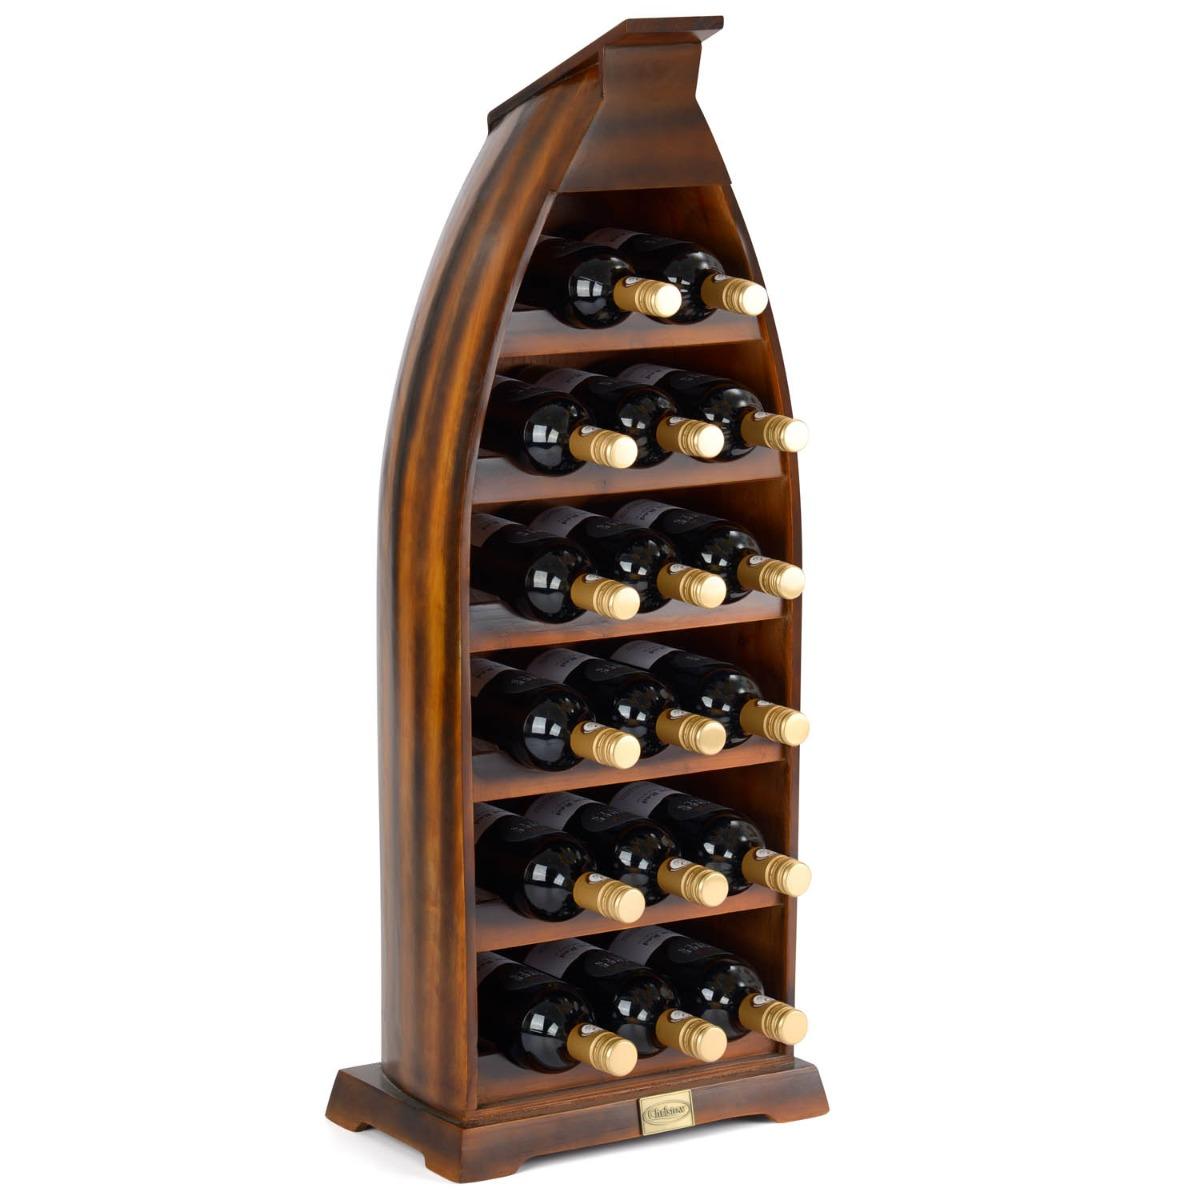 Image of 17 Bottle Boat Wine Rack - Dark